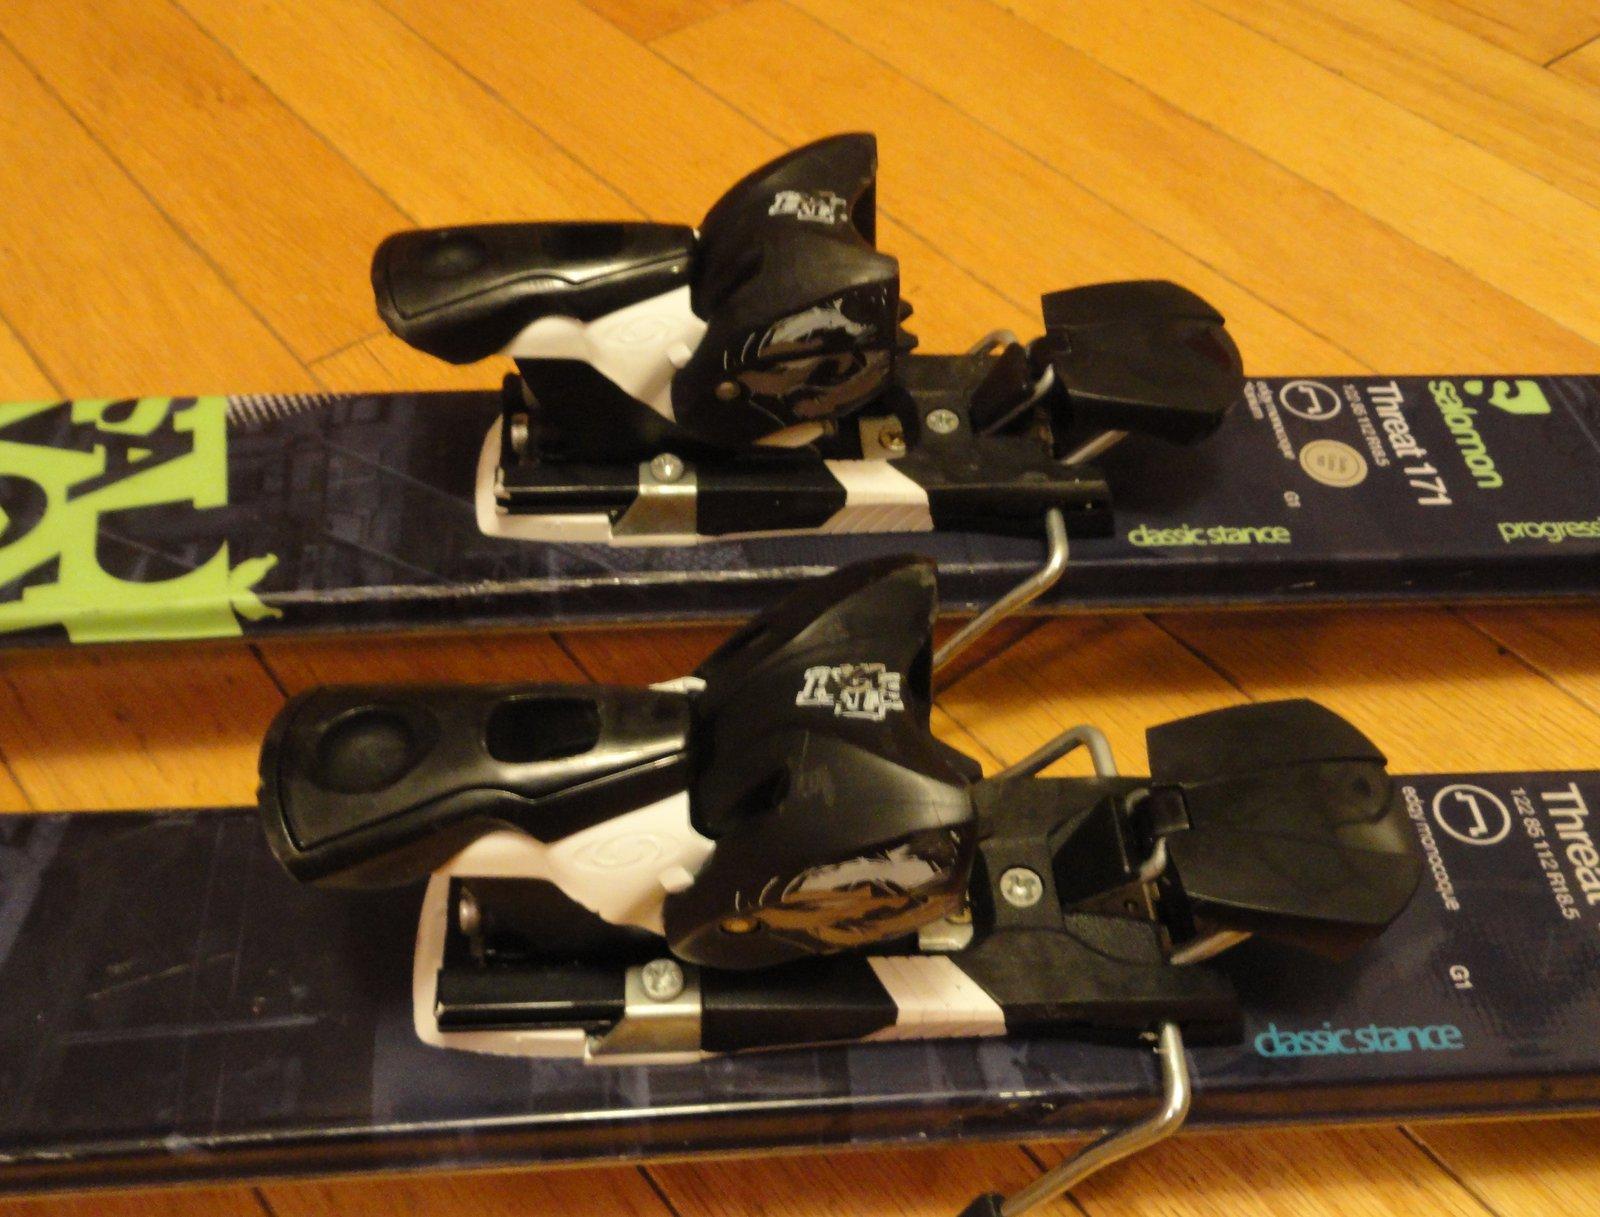 STH 12 Heels